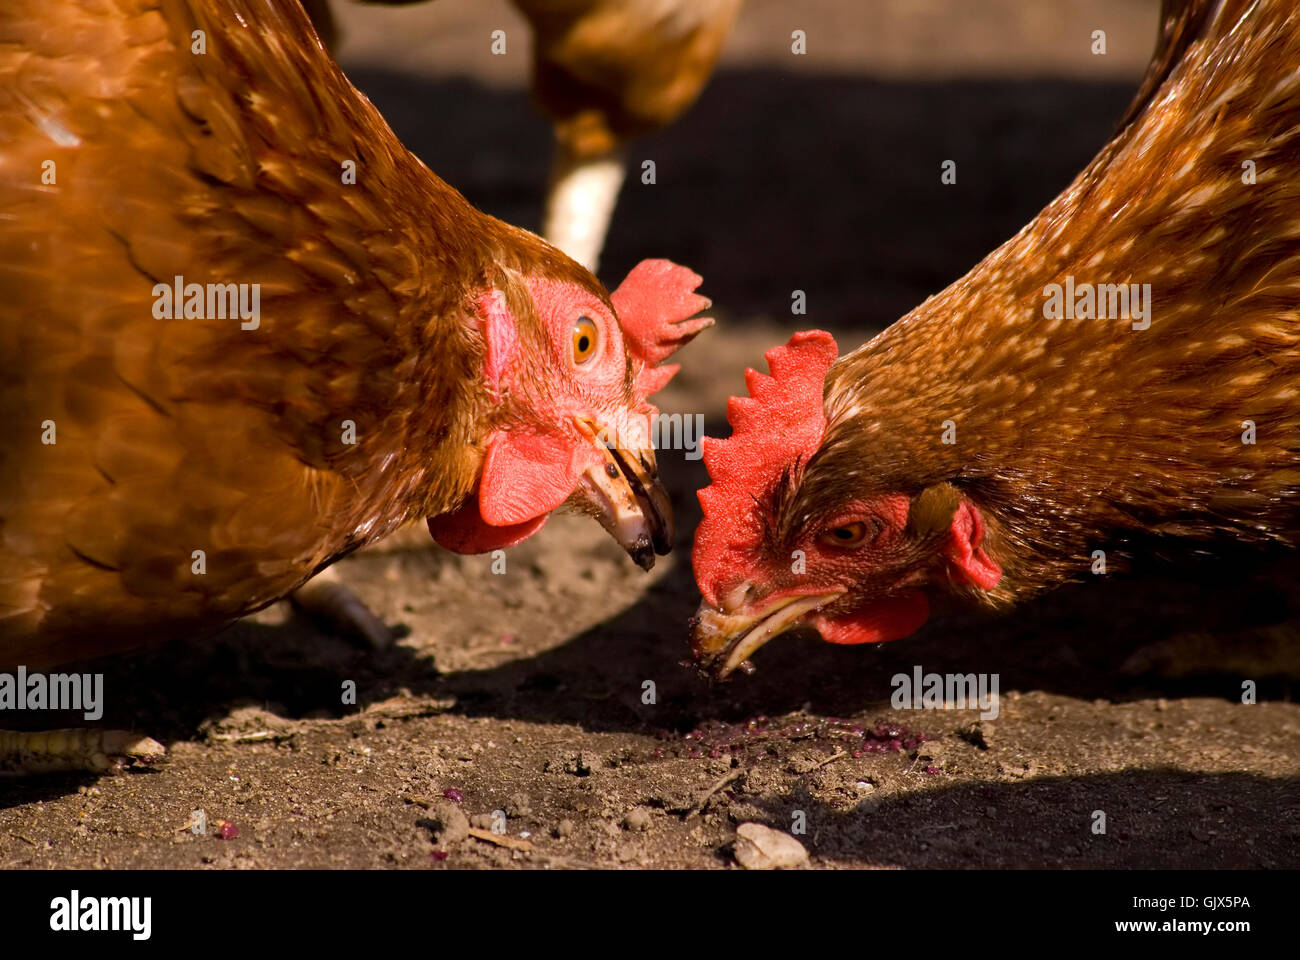 bird animals birds - Stock Image